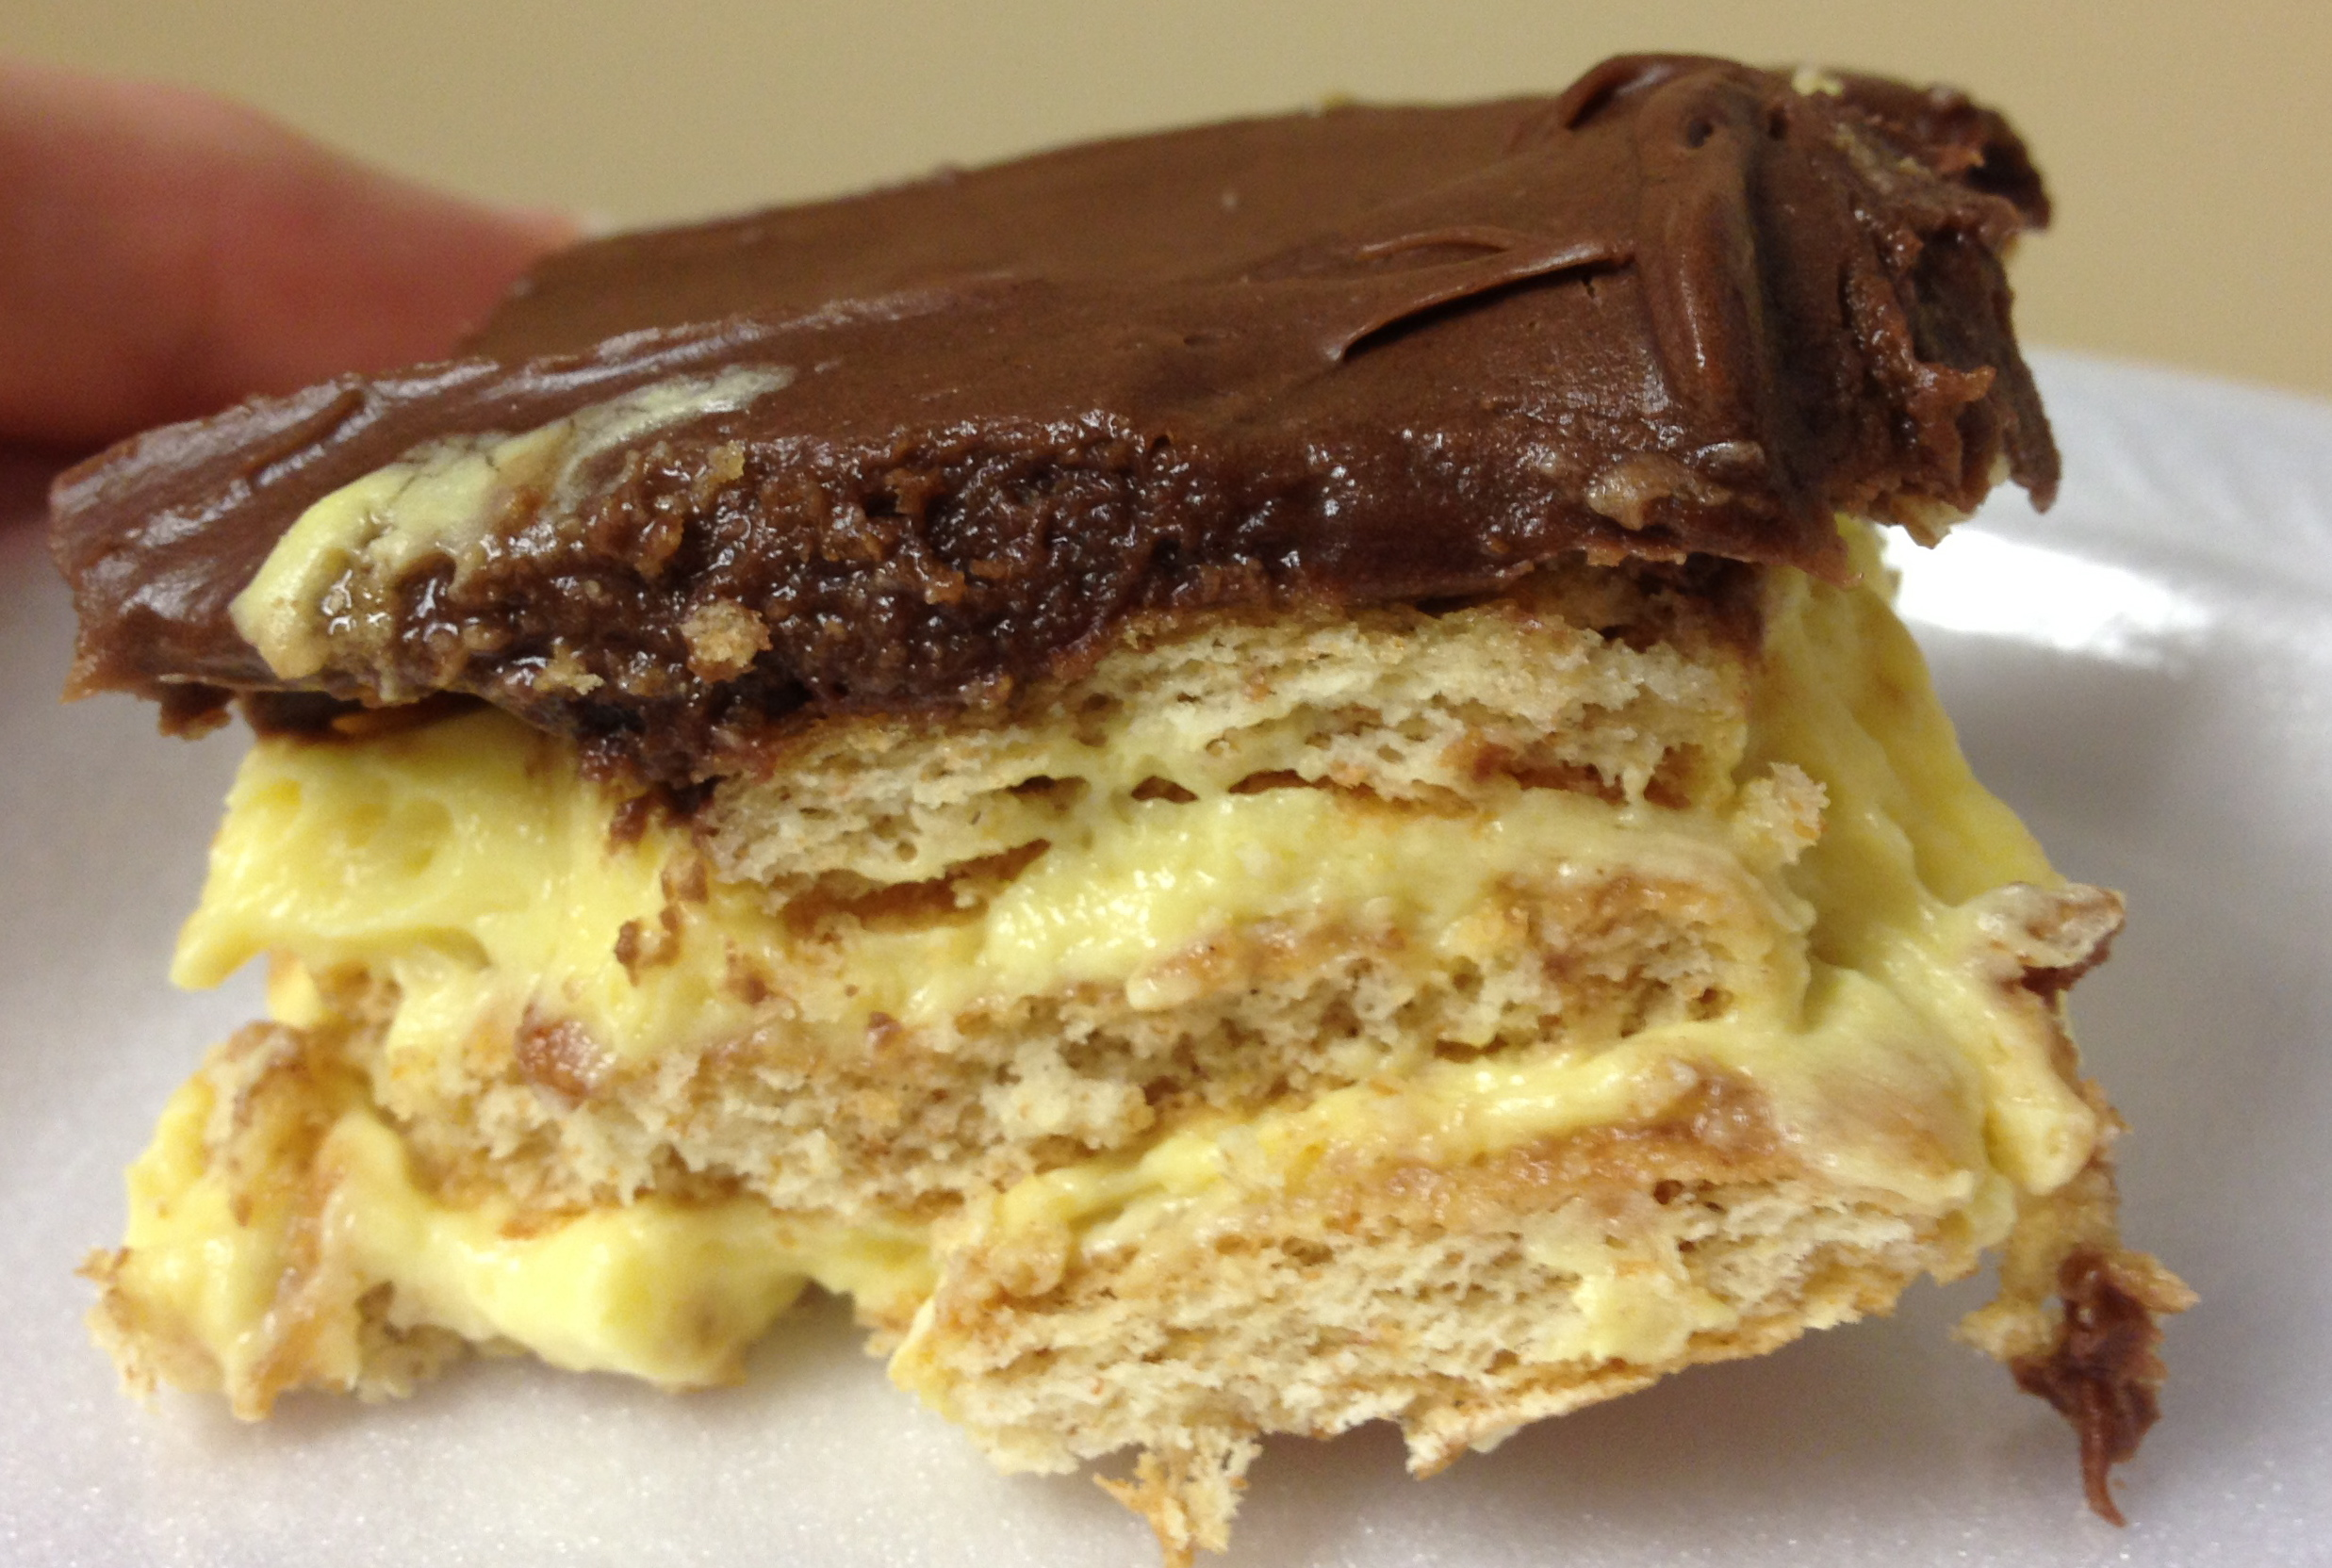 French eclair cake recipe - Best cake recipes